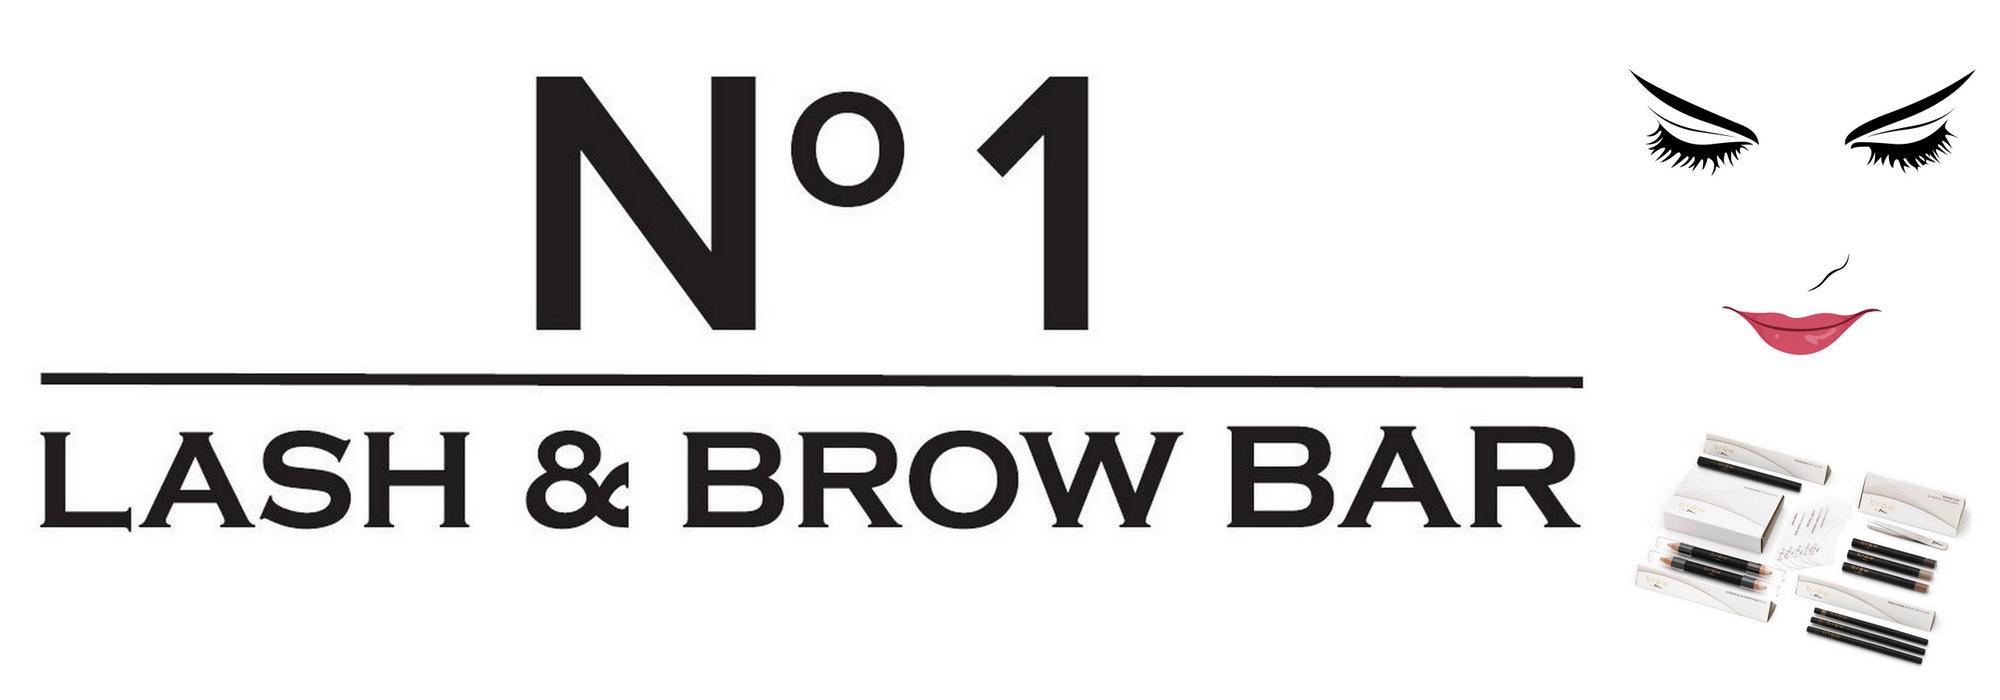 New! No. 1 Lash & Brow Bar